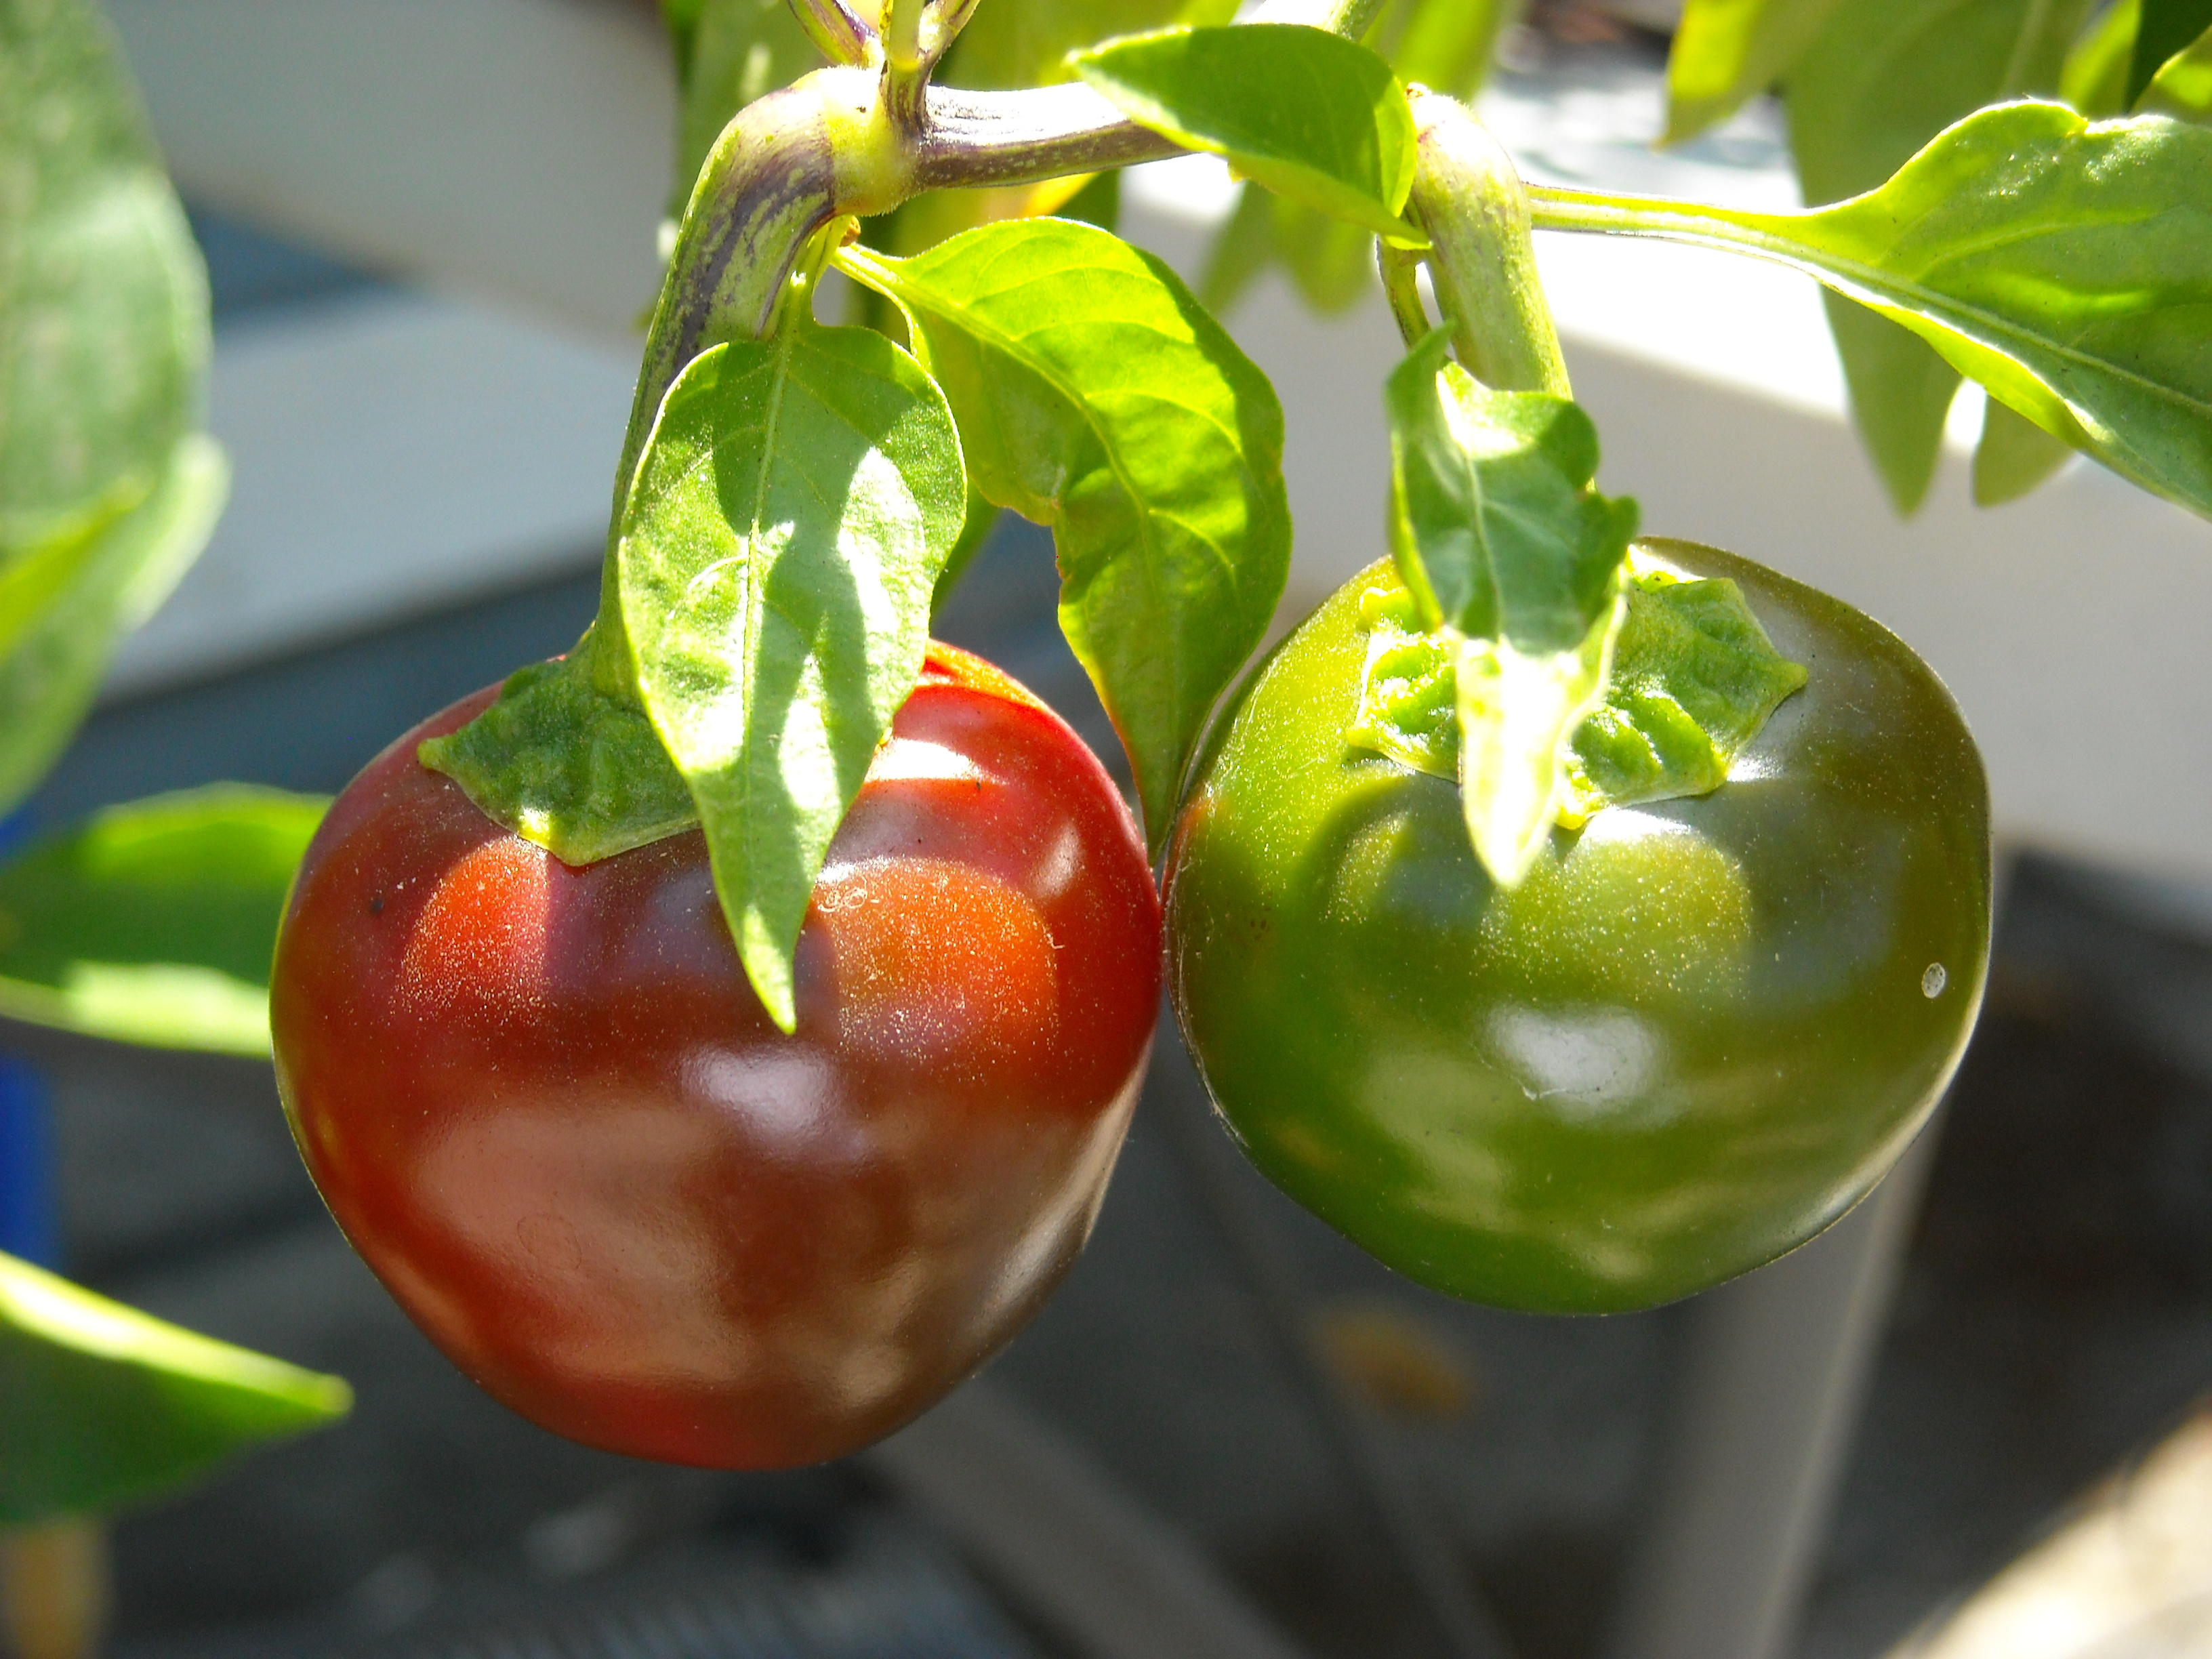 Cherry bomb peppers. Copyright GlutenFreeCuisine.org.